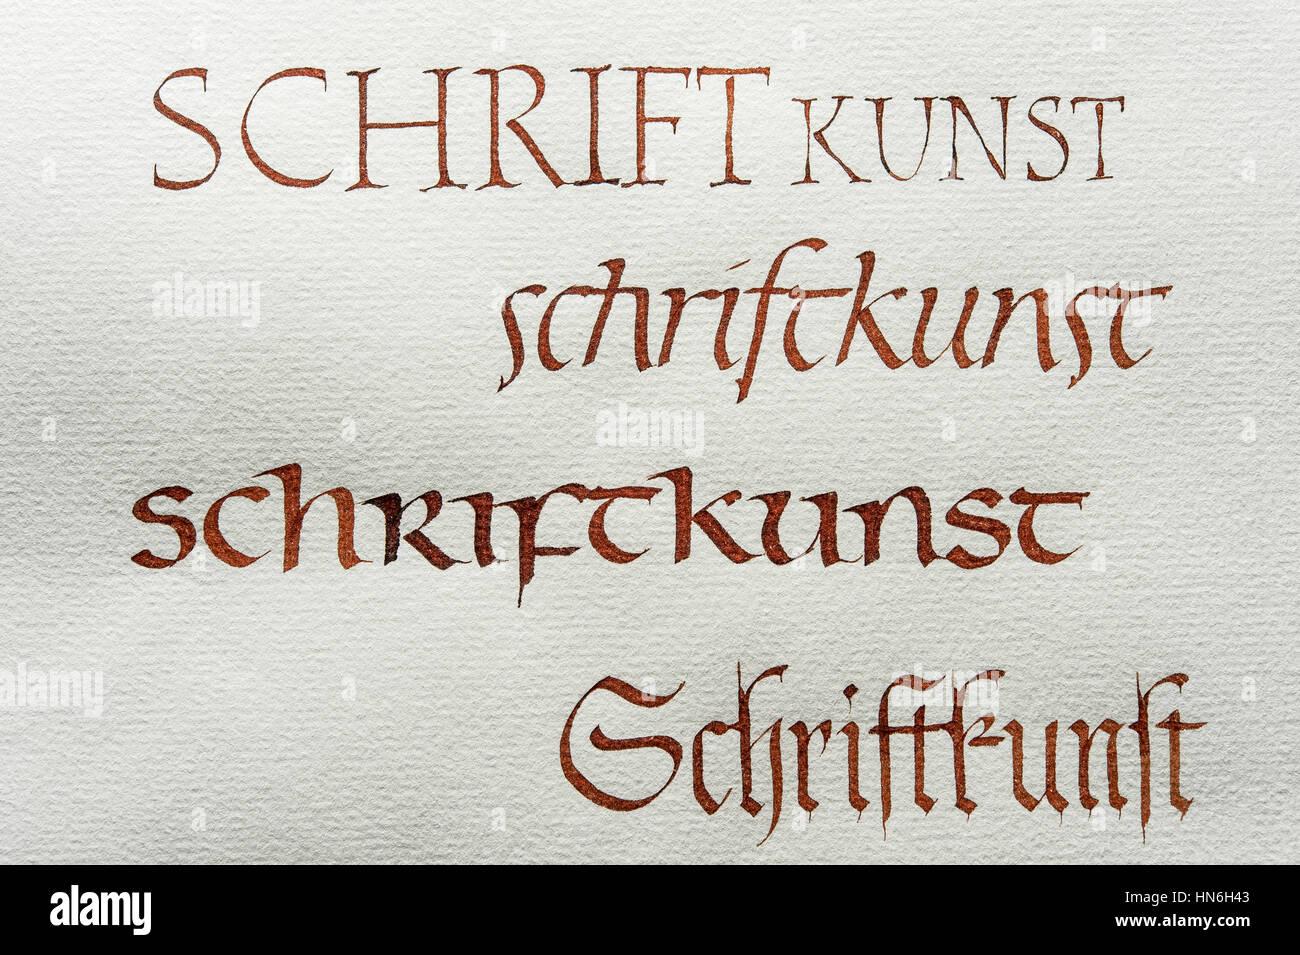 Calligraphy Studio Fonts Roman Capital Font Italics Insular Minuscule Gothic Script On Ingres Paper Seebruck